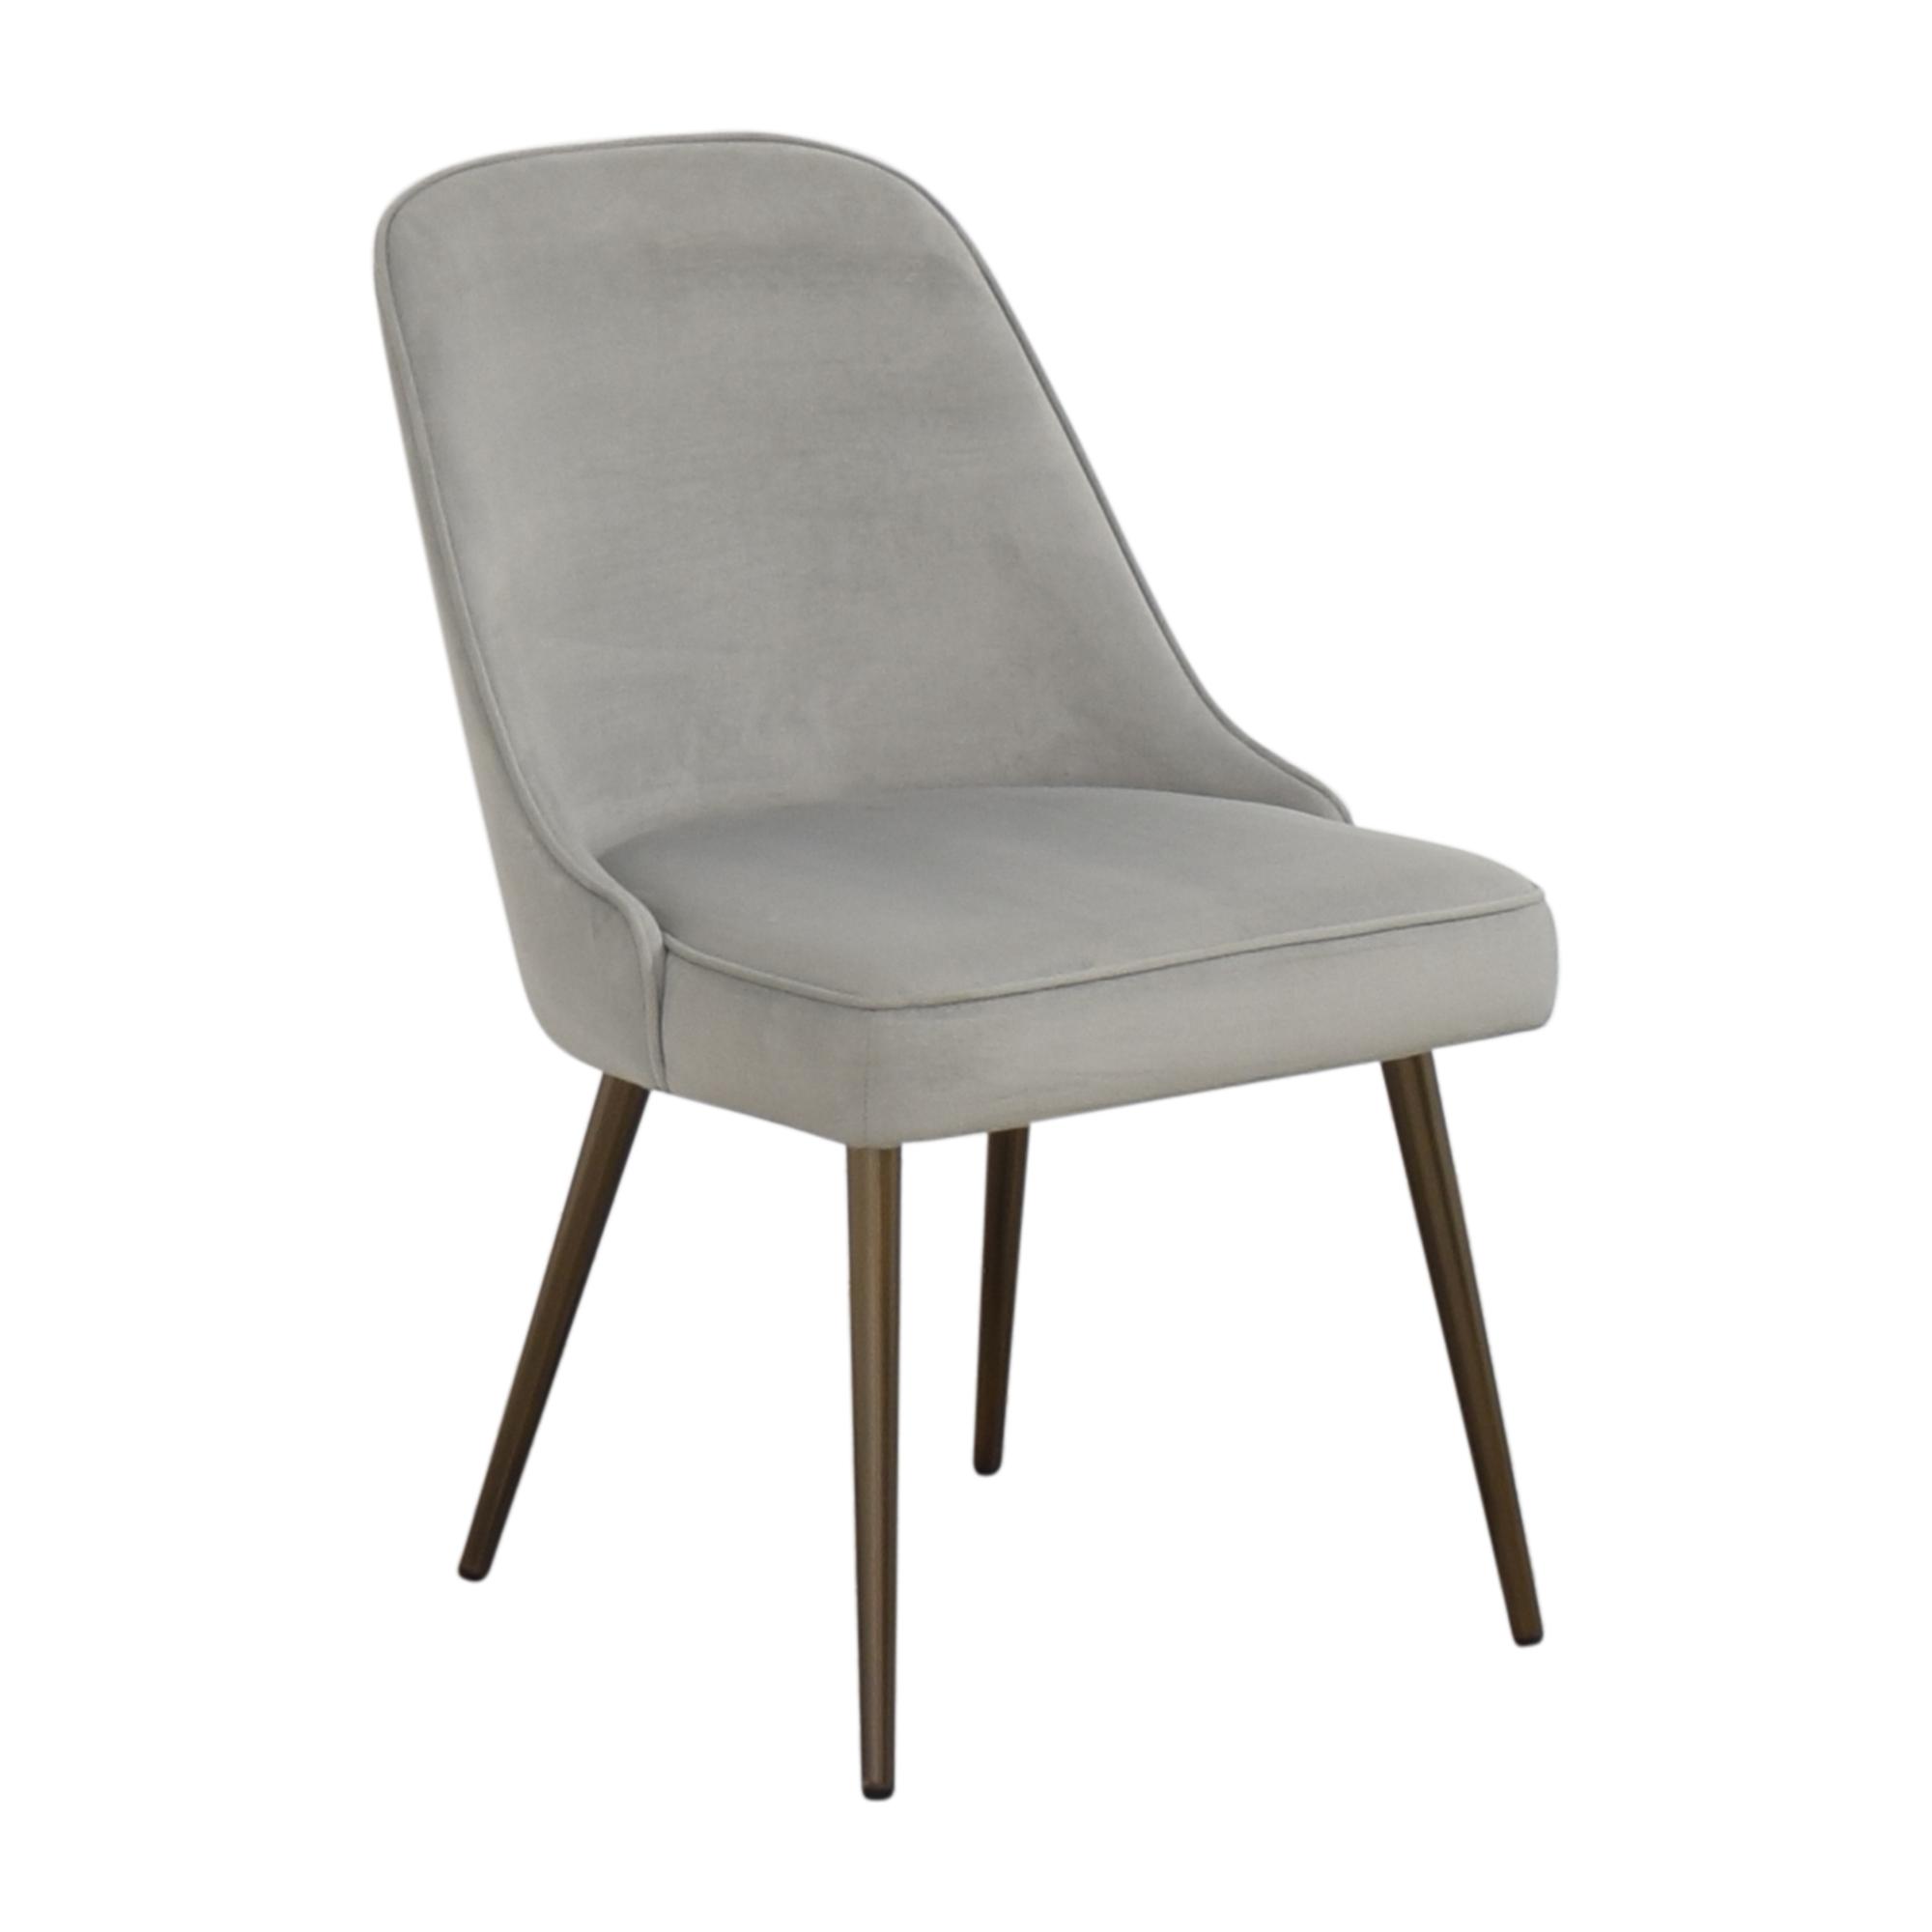 shop West Elm West Elm Mid Century Upholstered Dining Chair online